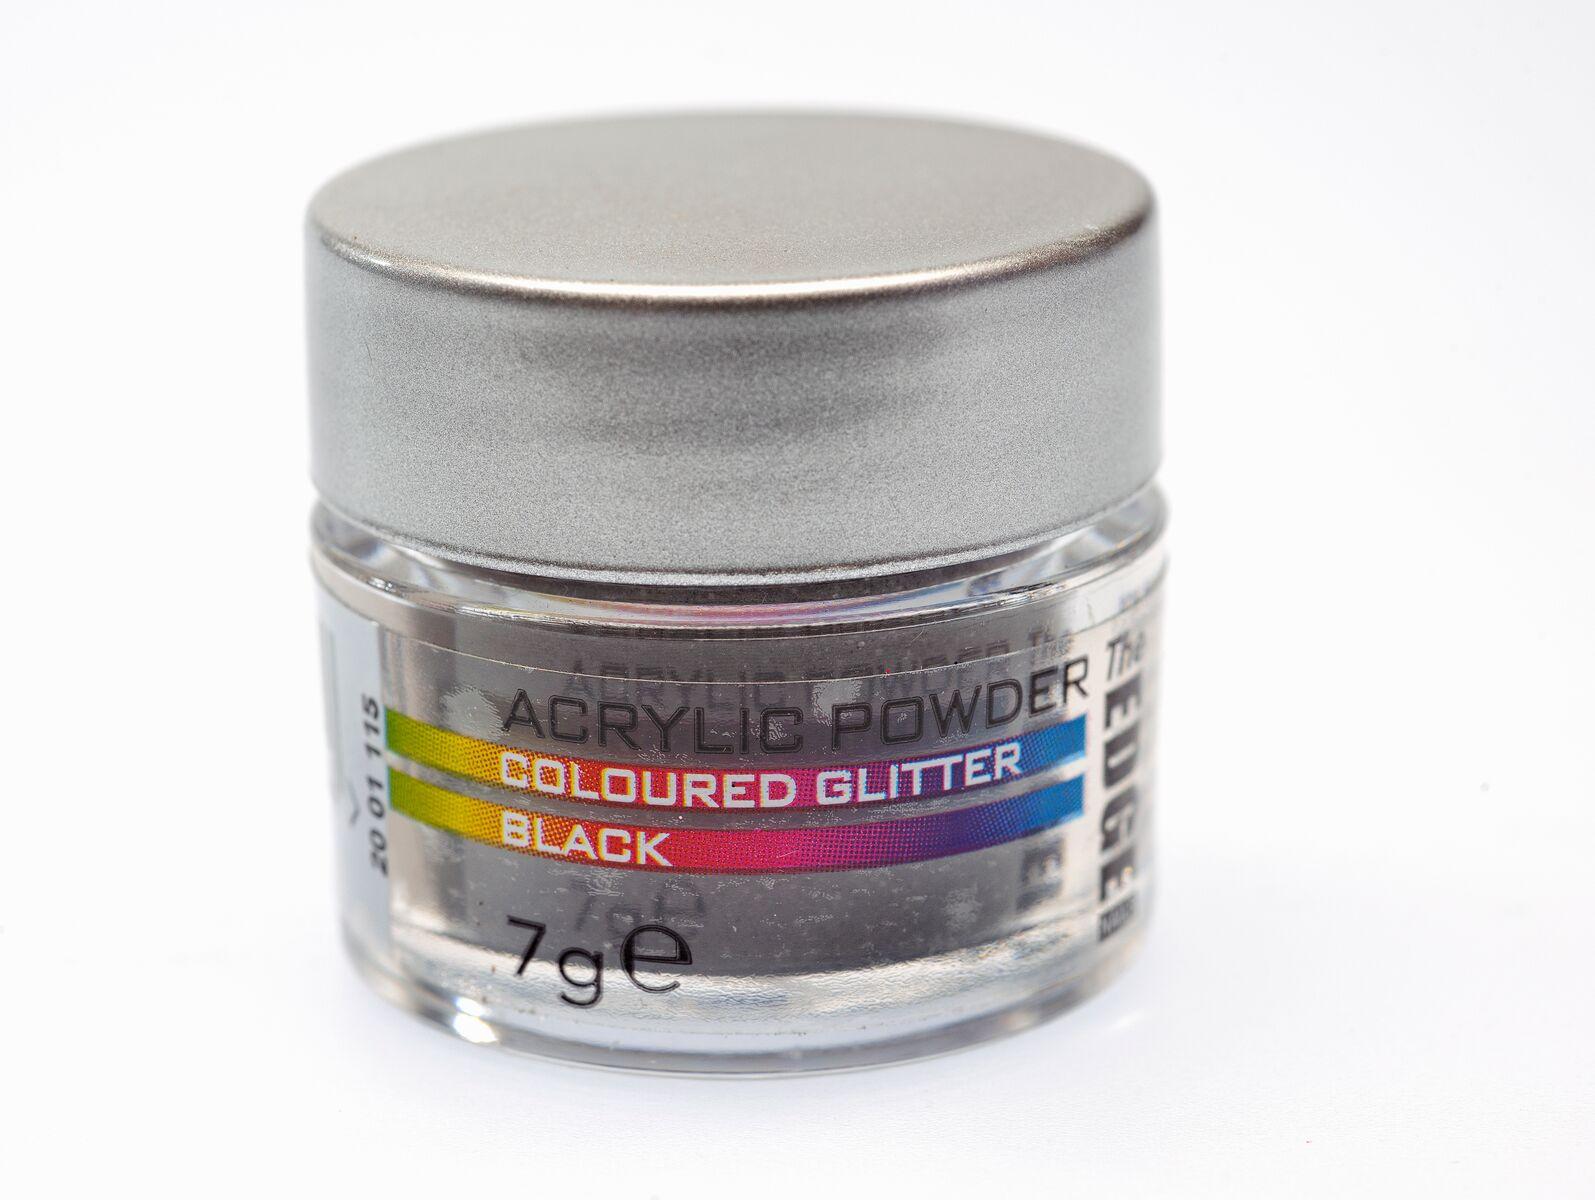 THE EDGE Acrylic Glitter Powder Black 7 gr